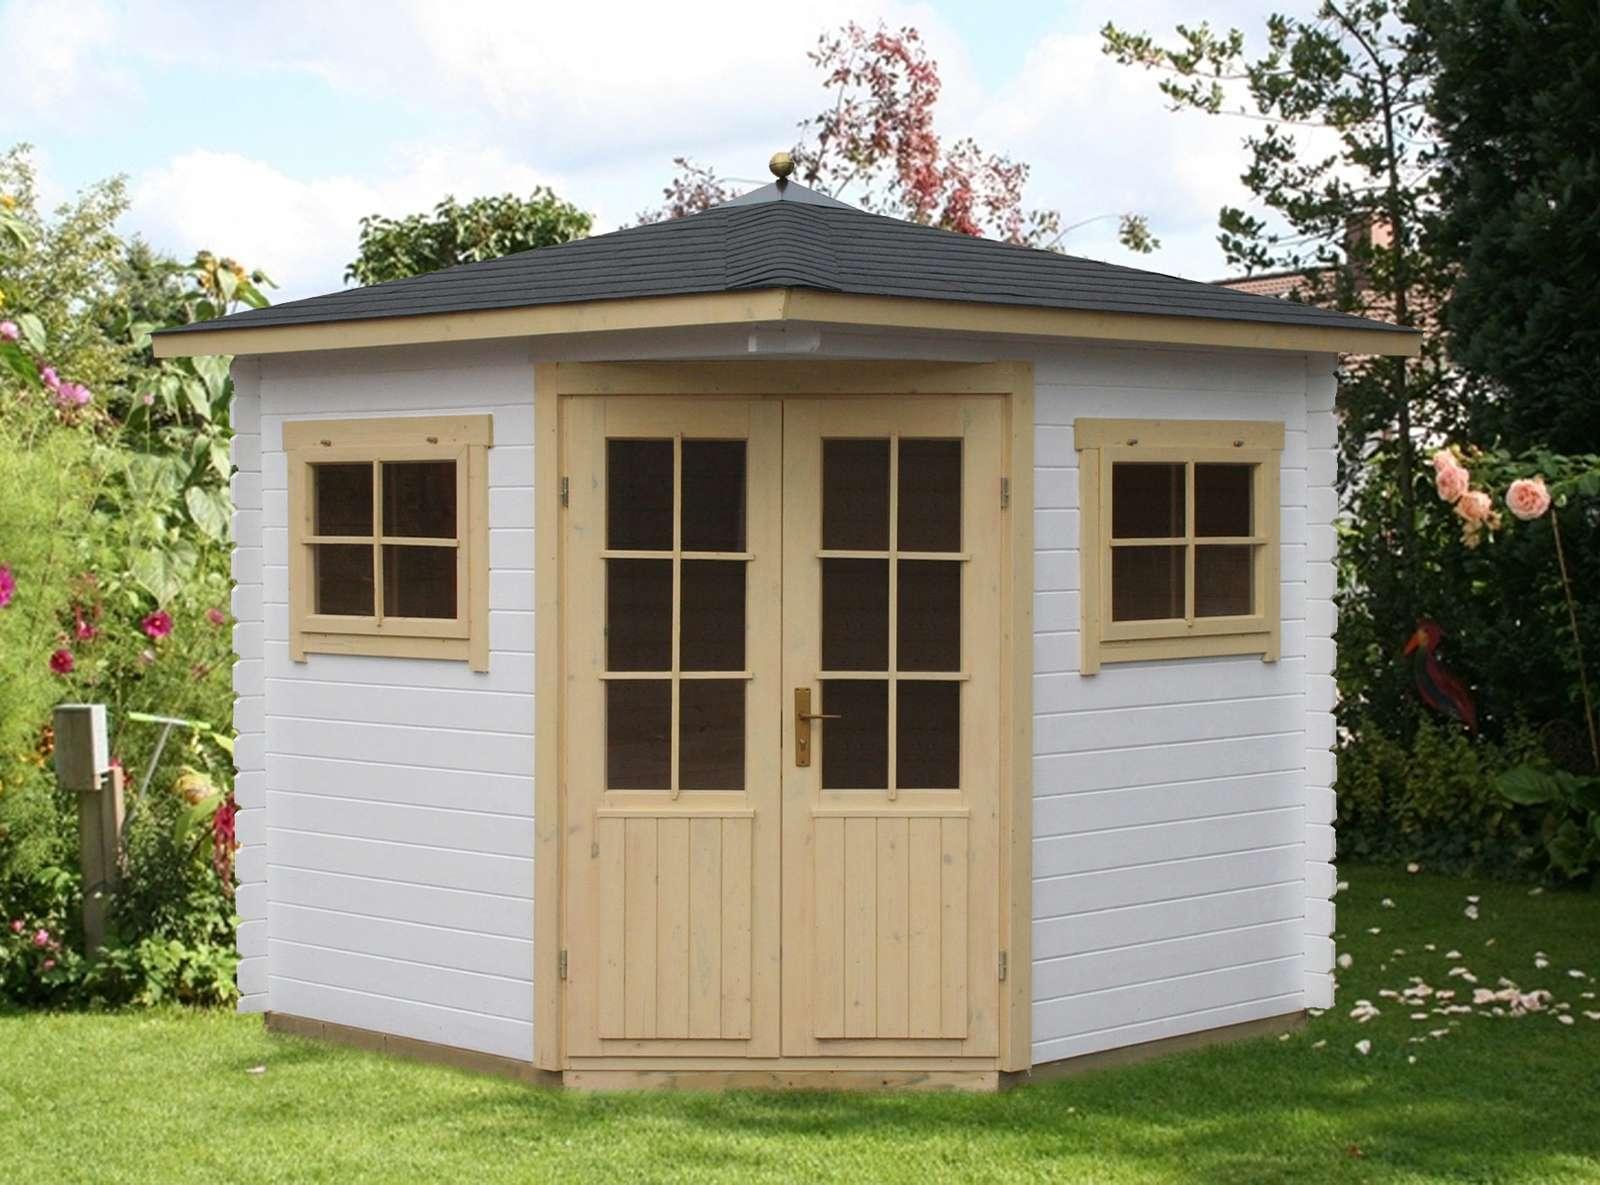 f nfeck gartenhaus aufbauen my blog. Black Bedroom Furniture Sets. Home Design Ideas